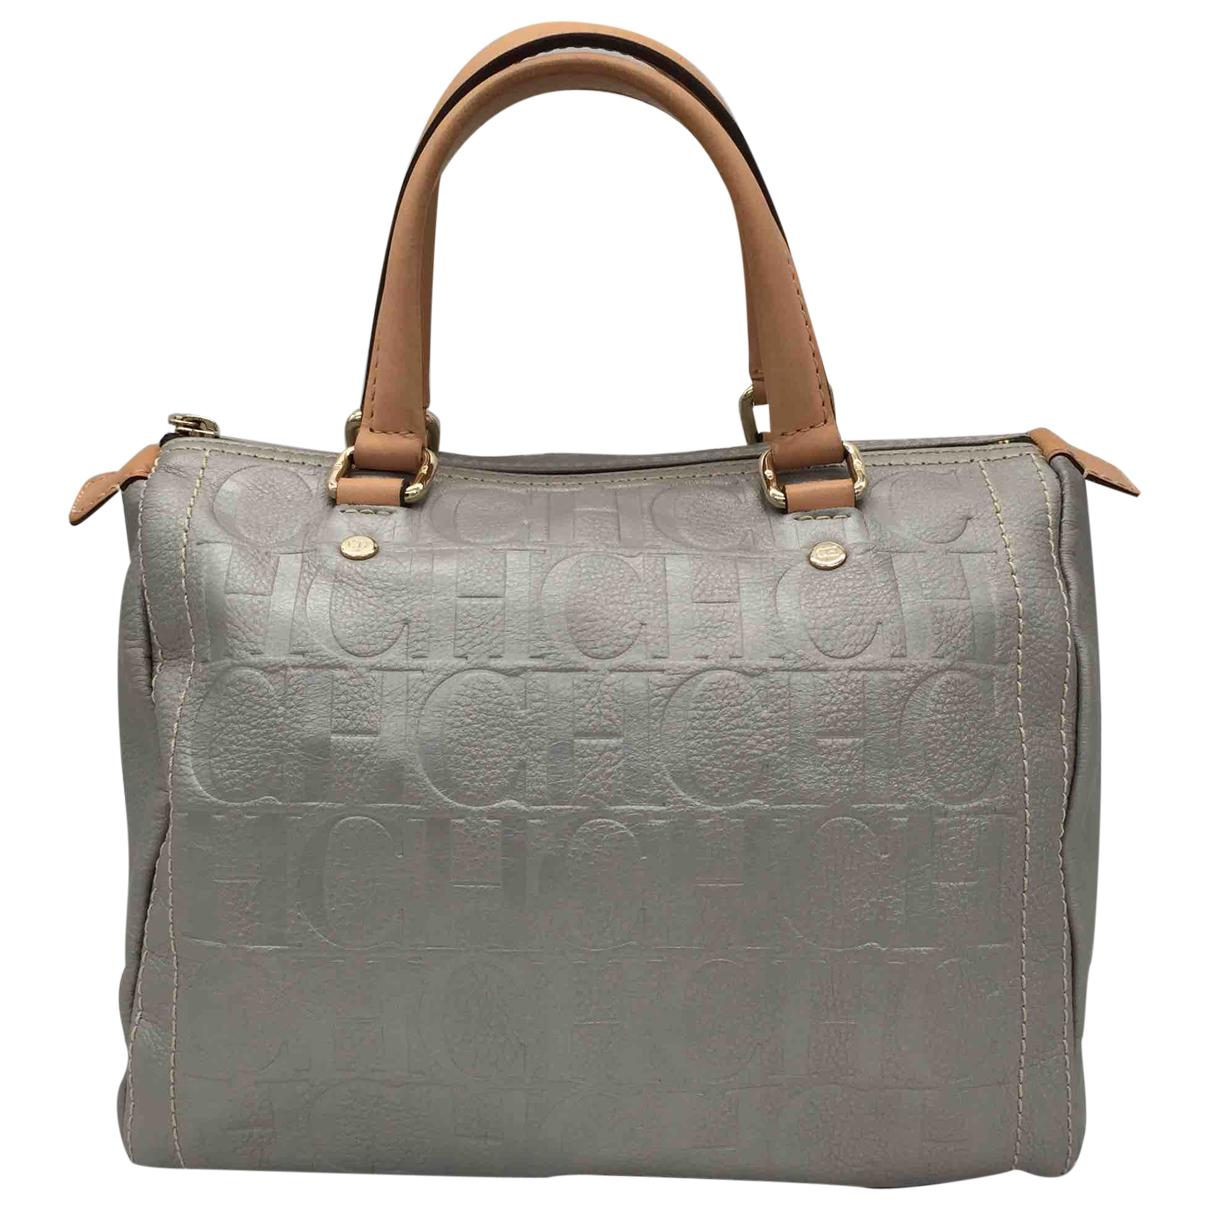 Carolina Herrera N Silver Leather handbag for Women N